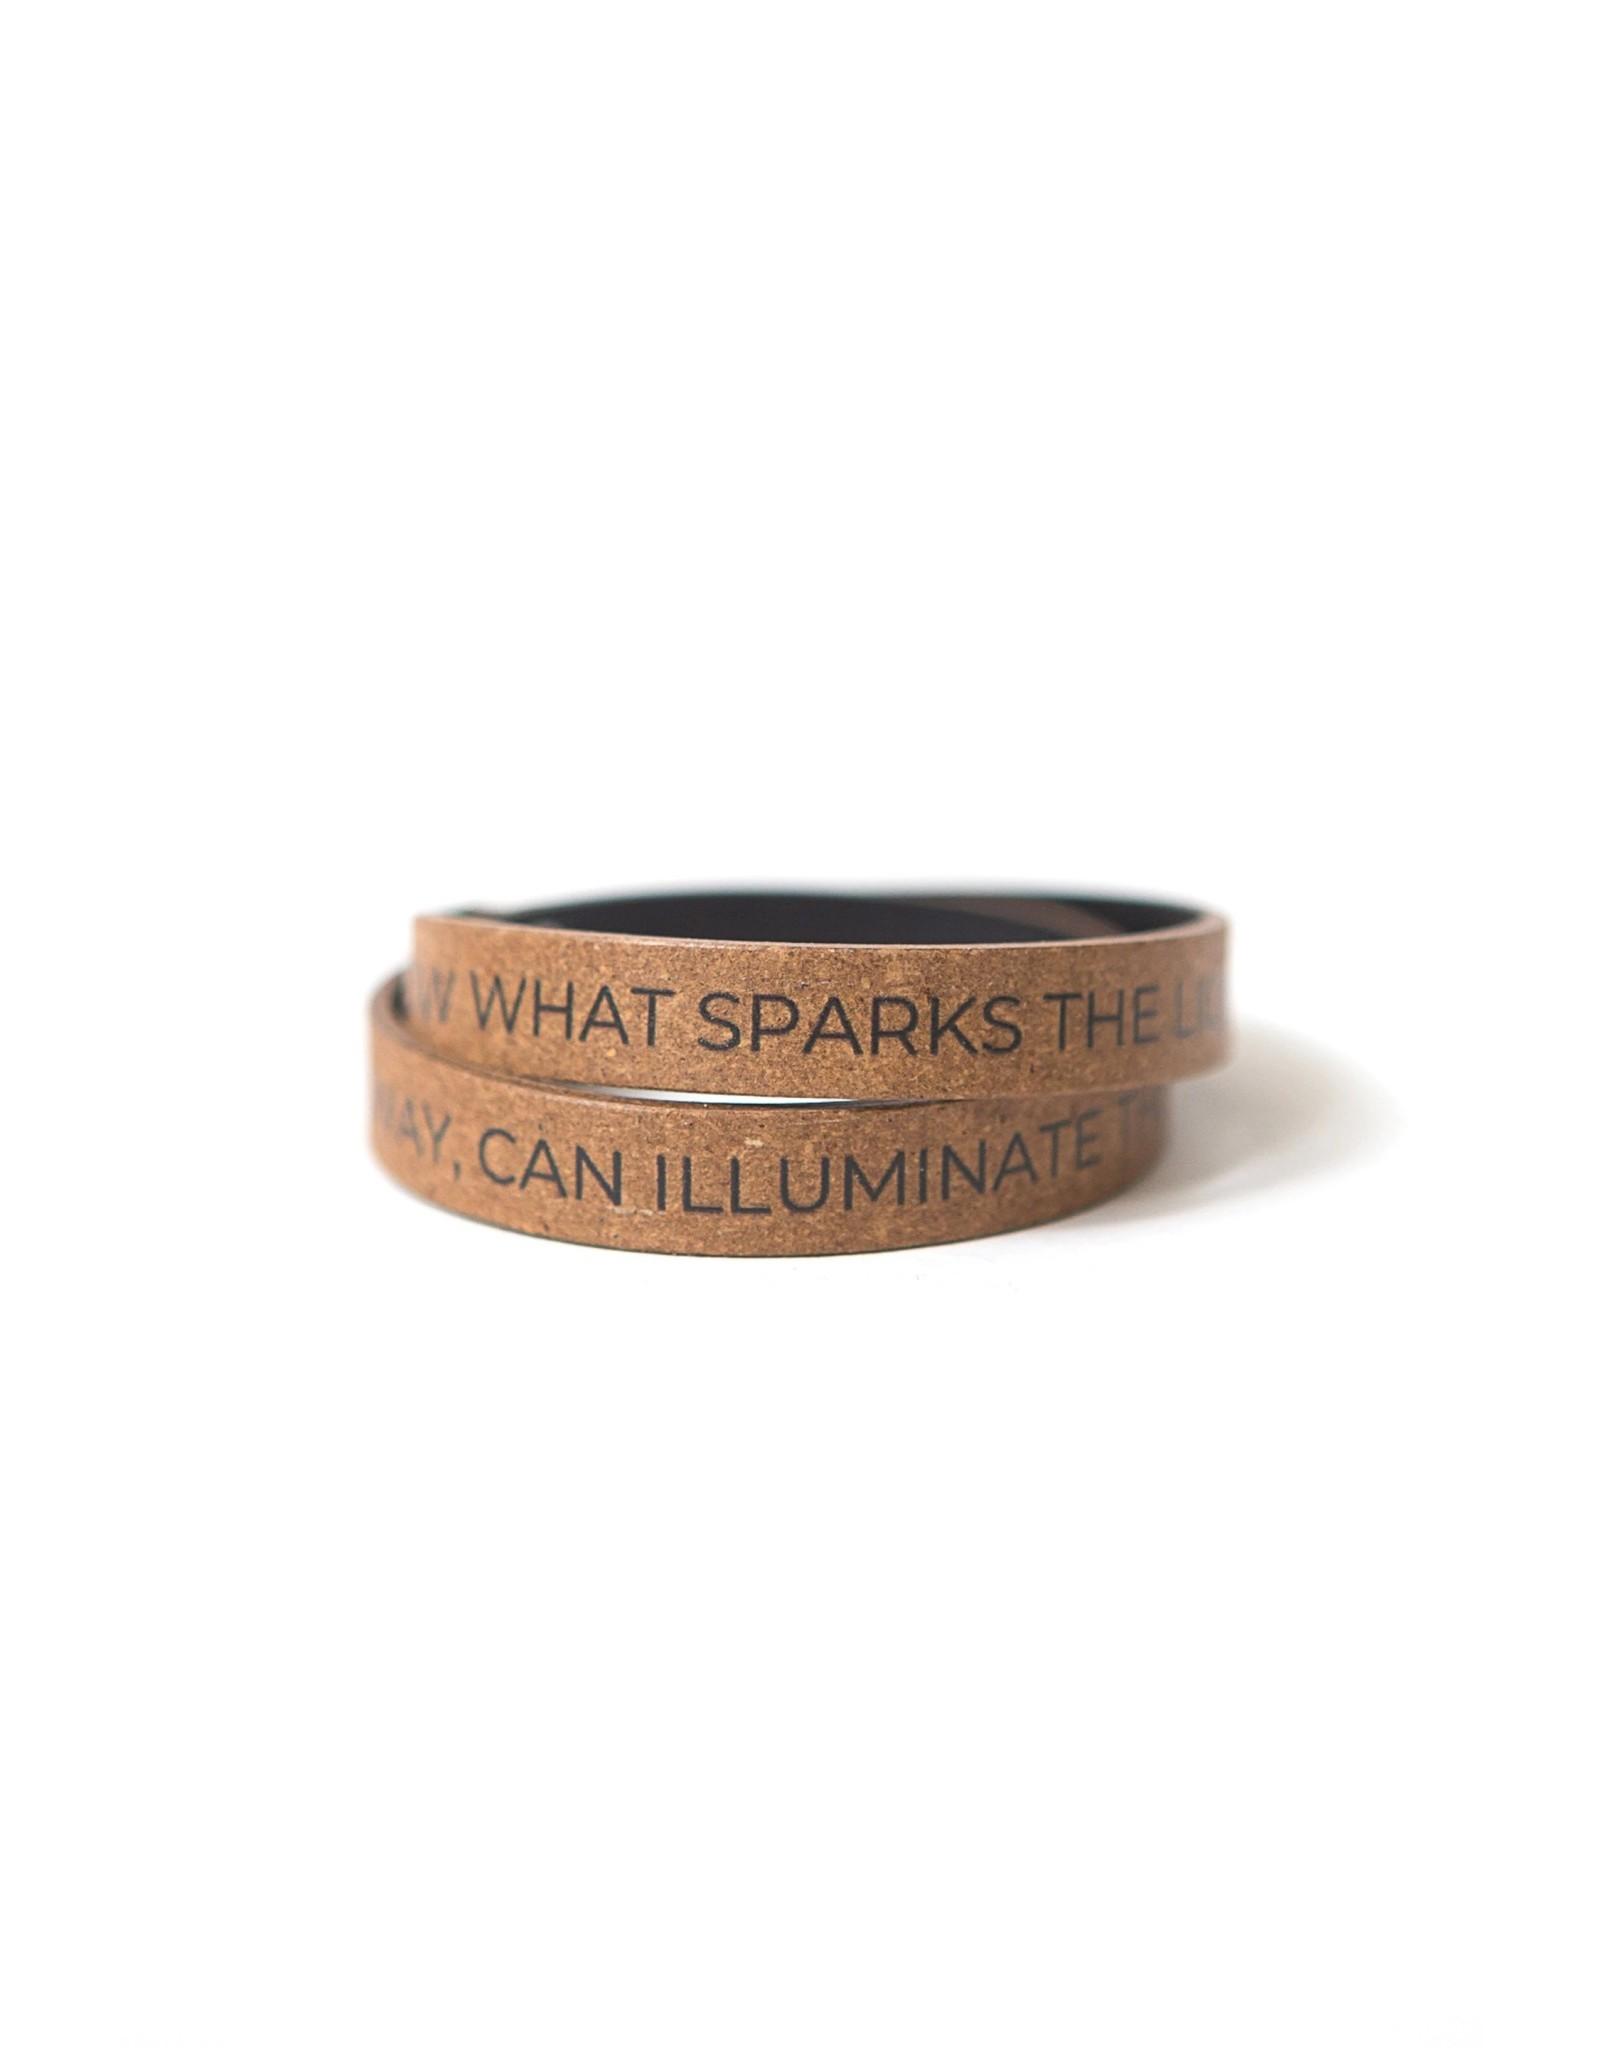 Fair Anita Illuminate the World Leather Wrap Bracelet, South Africa